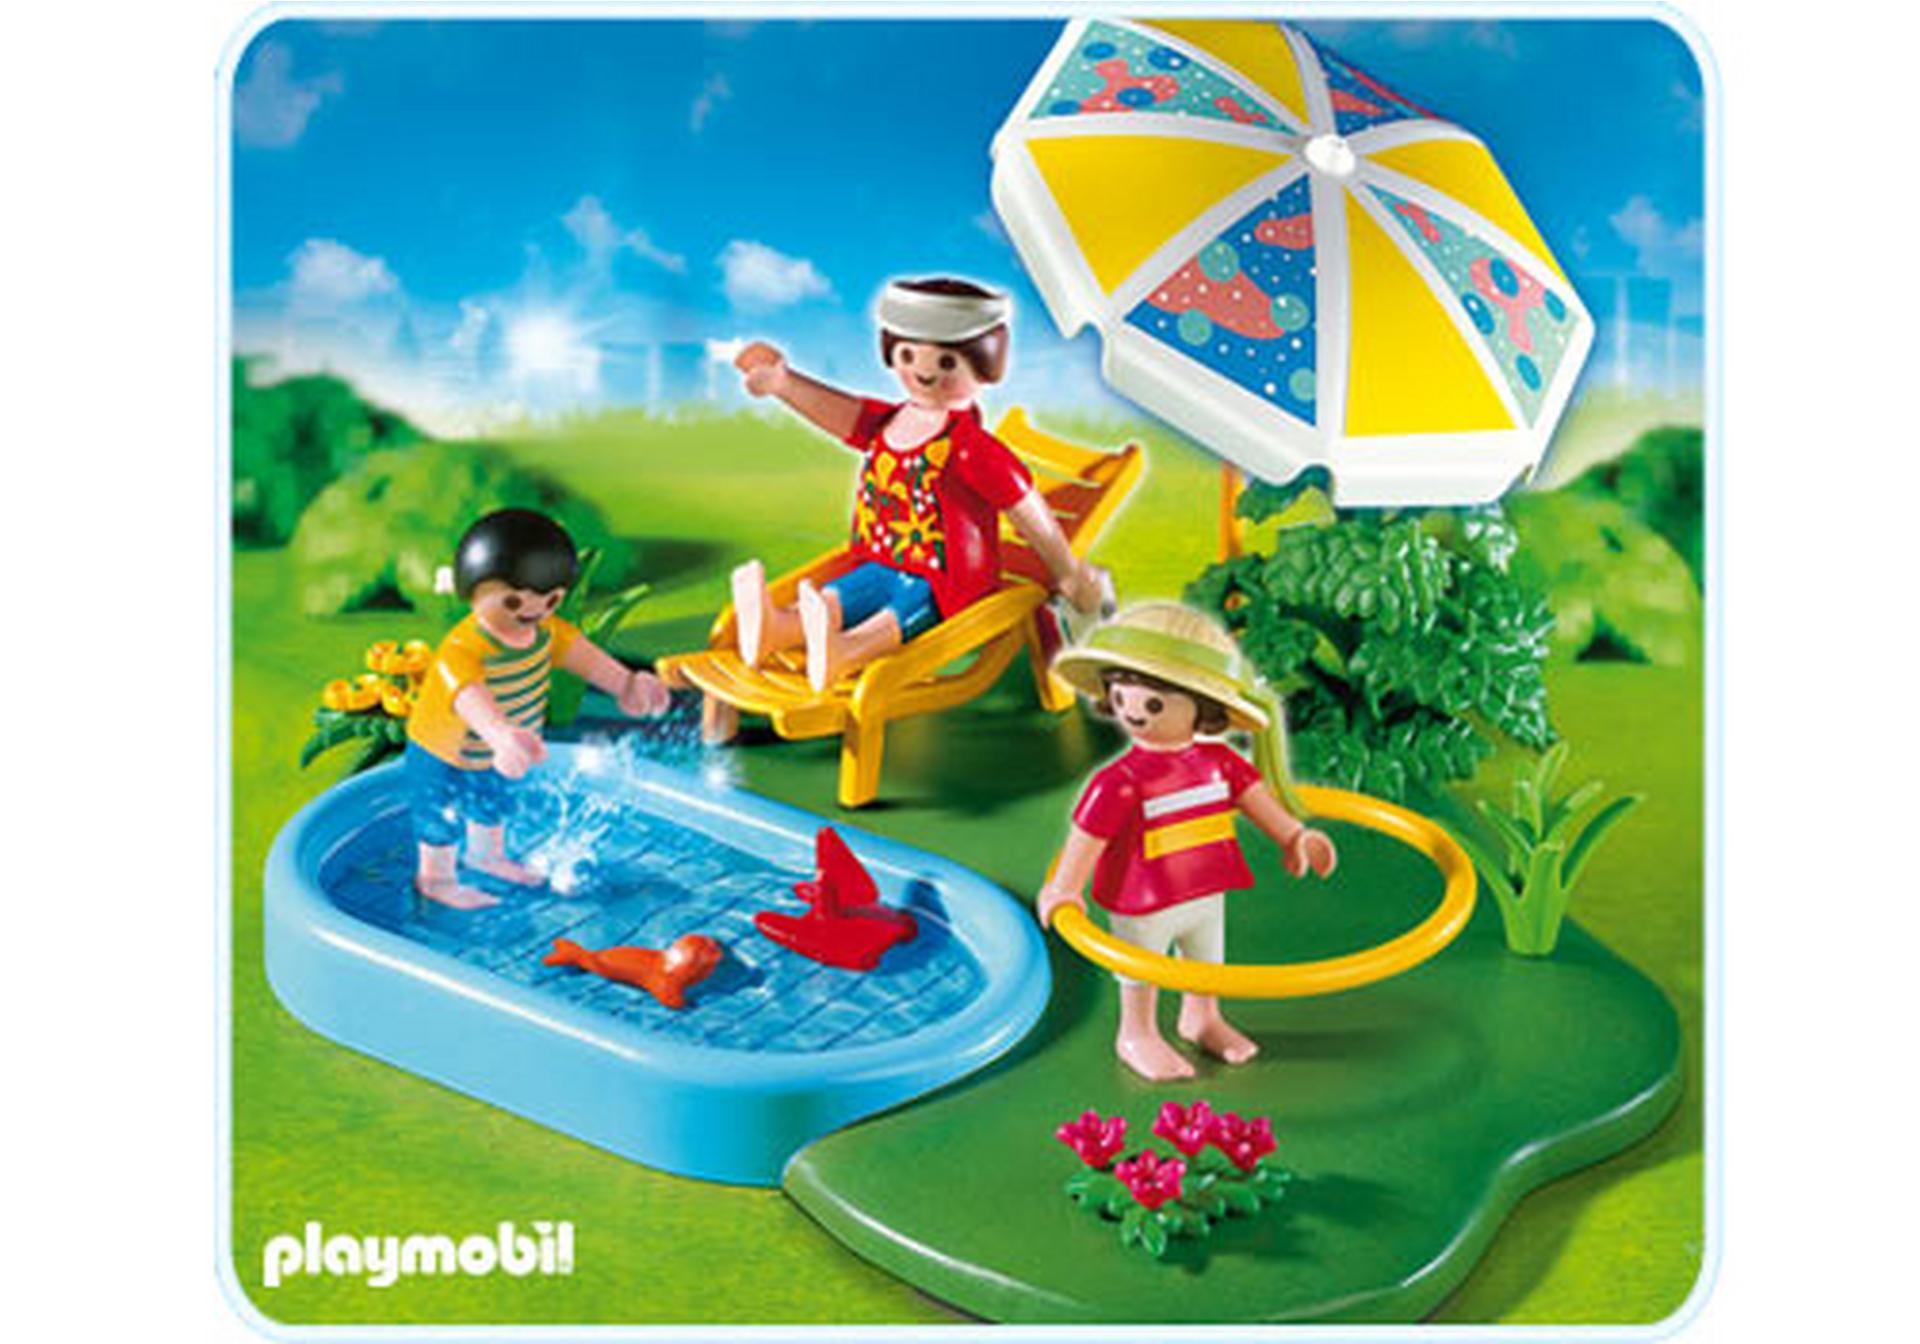 Compactset famille et piscine 4140 a playmobil france for Piscine playmobil